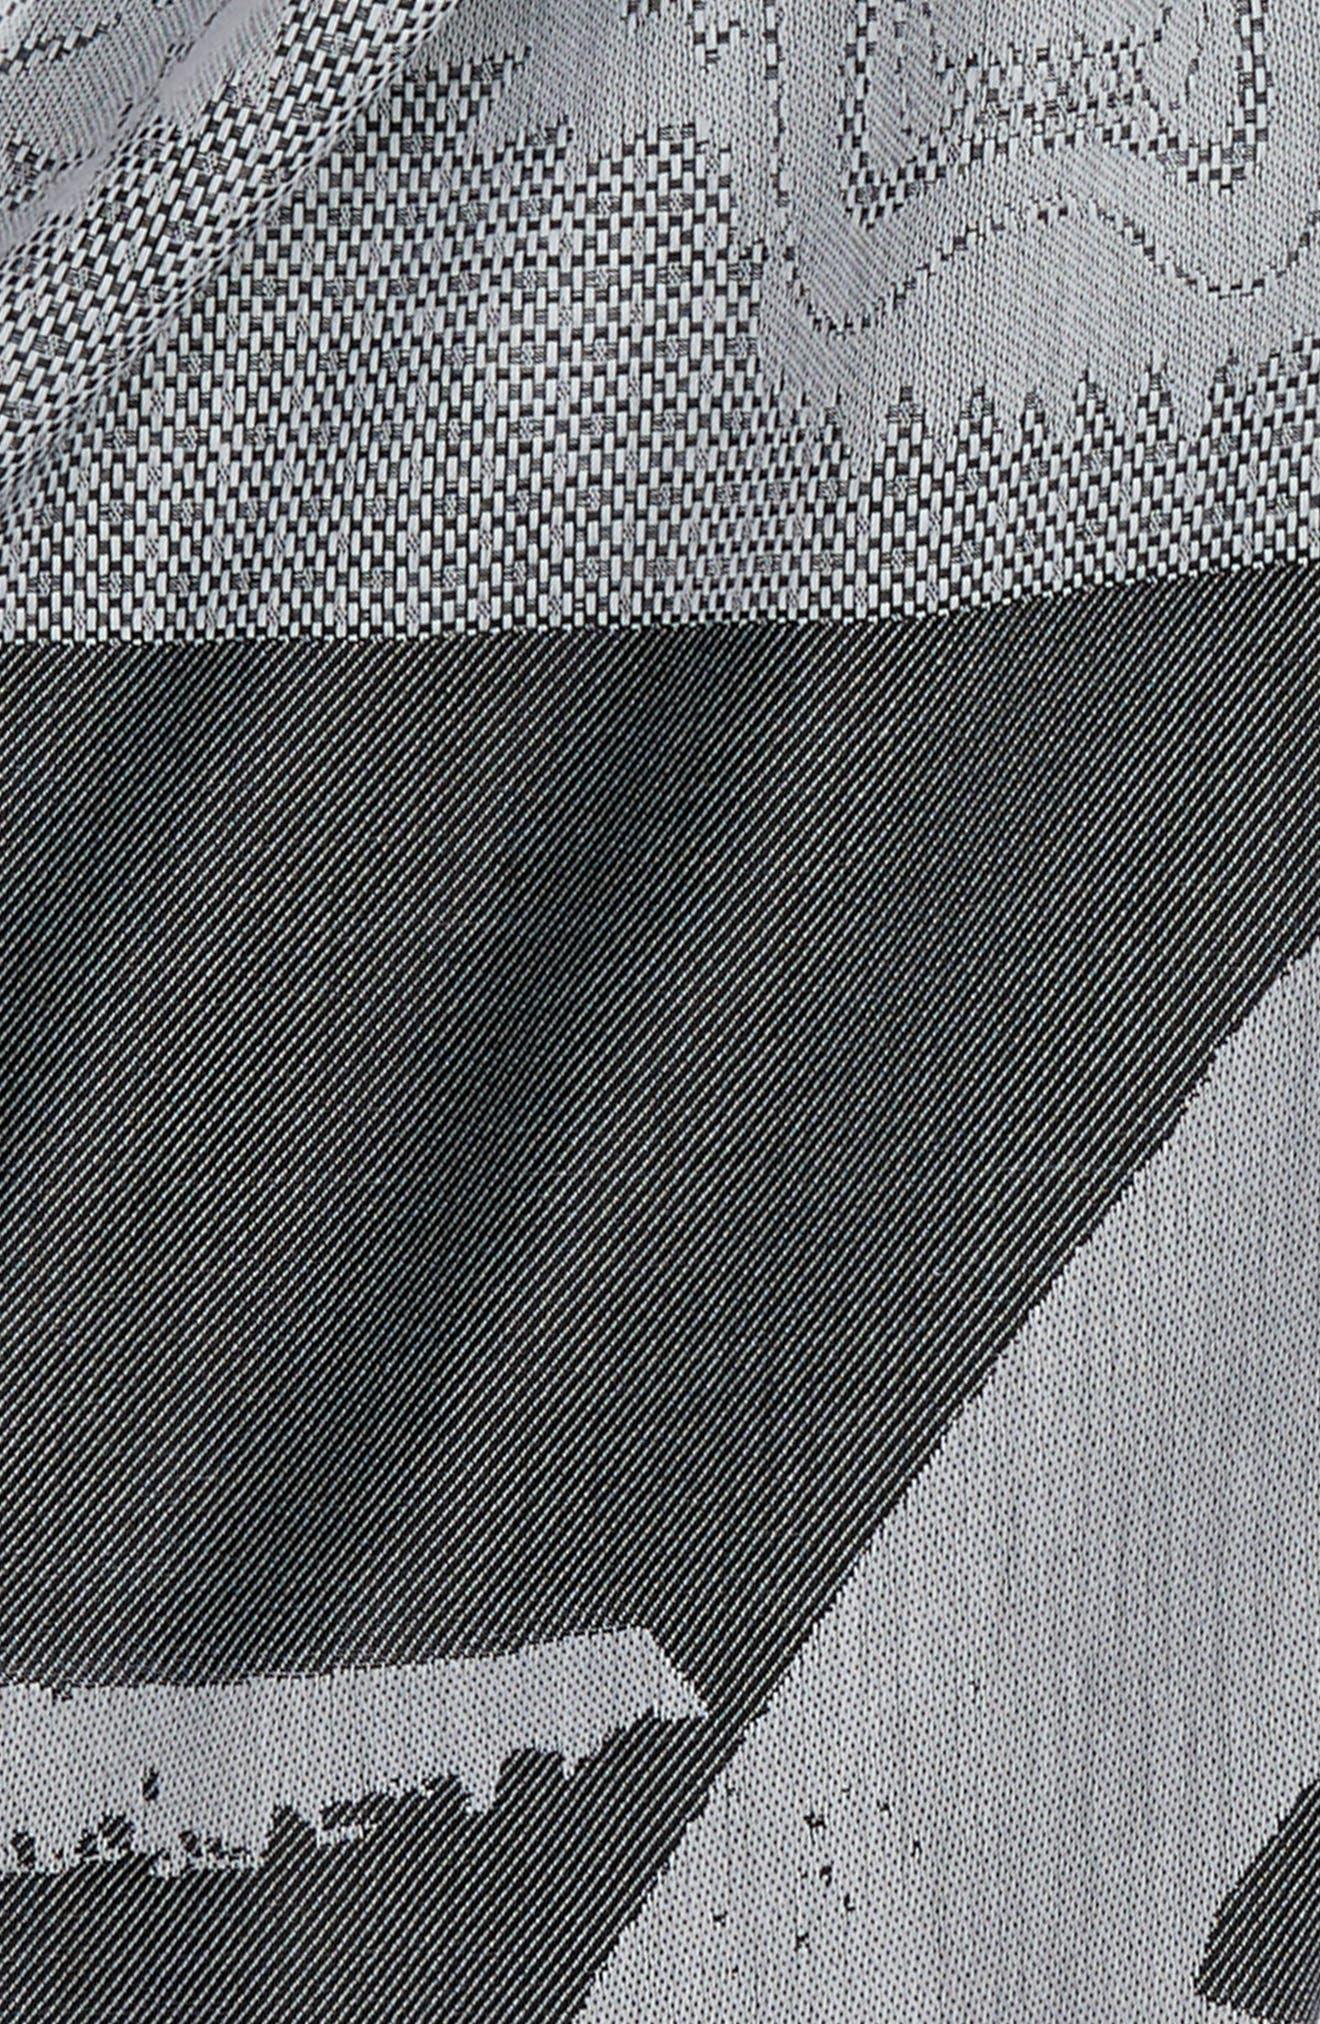 Multi Icons Cotton & Silk Scarf,                             Alternate thumbnail 4, color,                             022